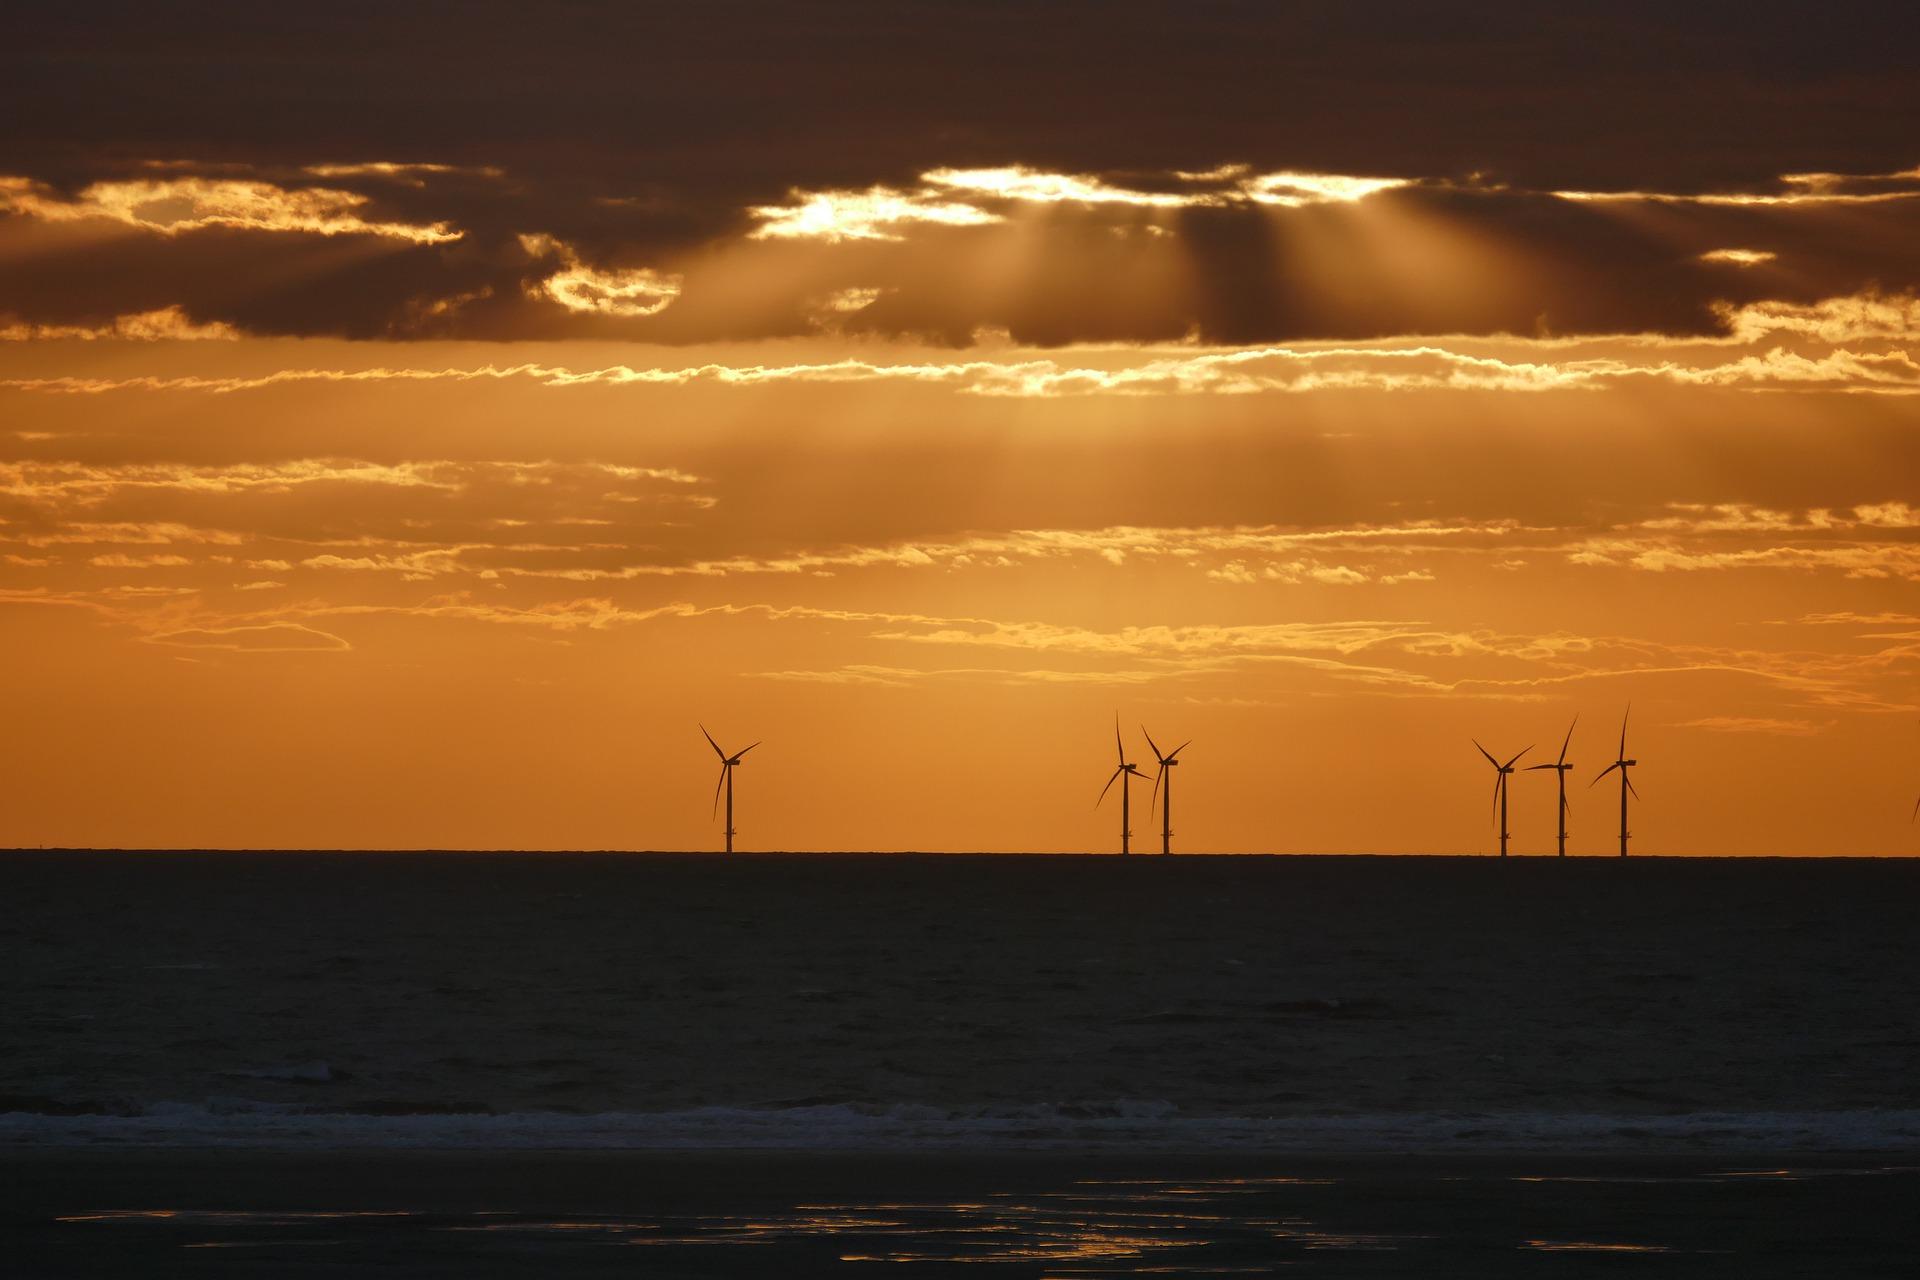 wind-power-5434278_1920